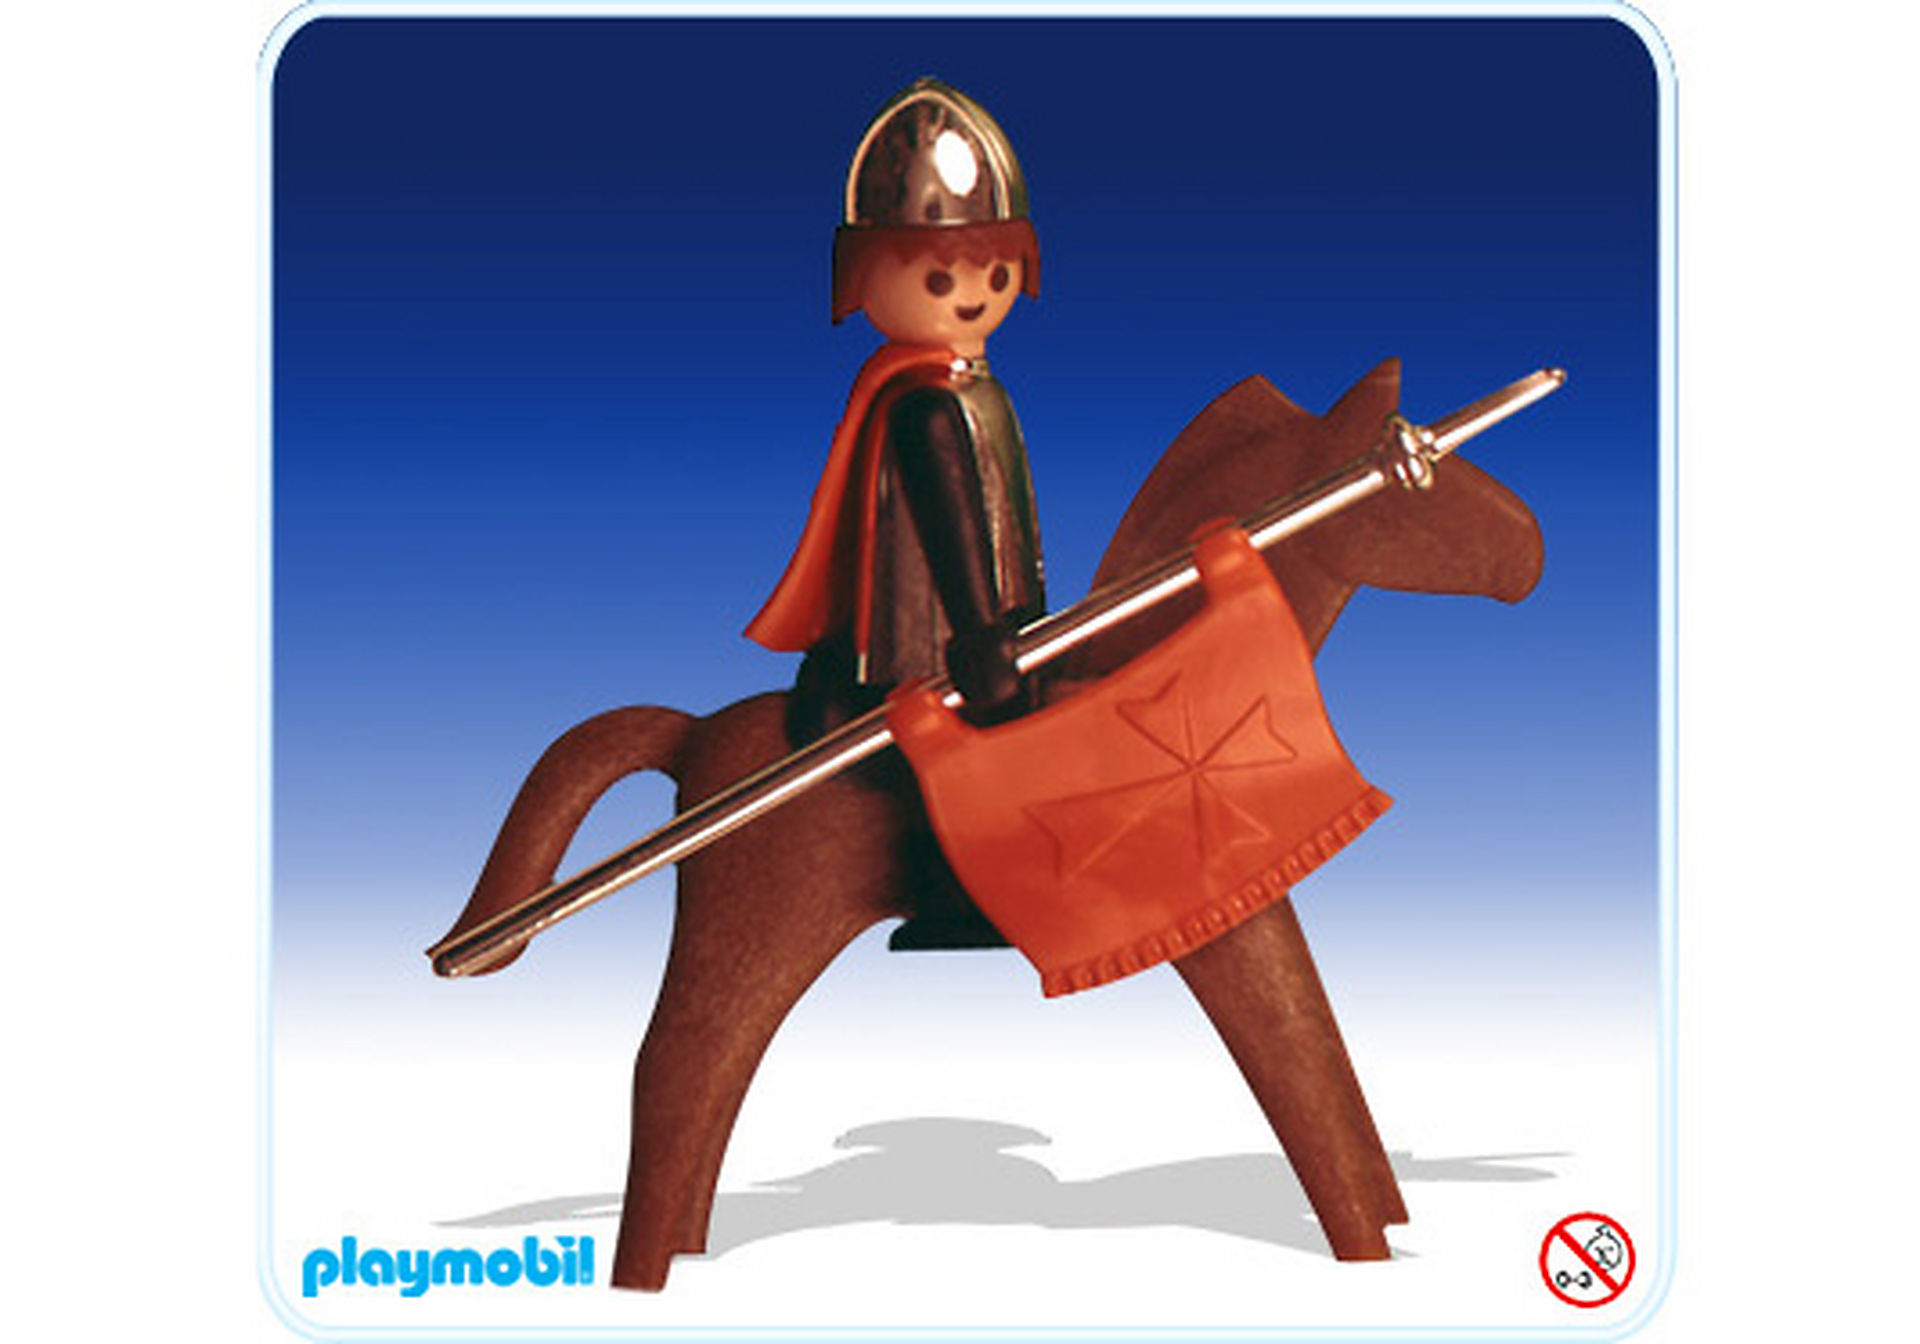 3265-A Ritter zu Pferd zoom image1